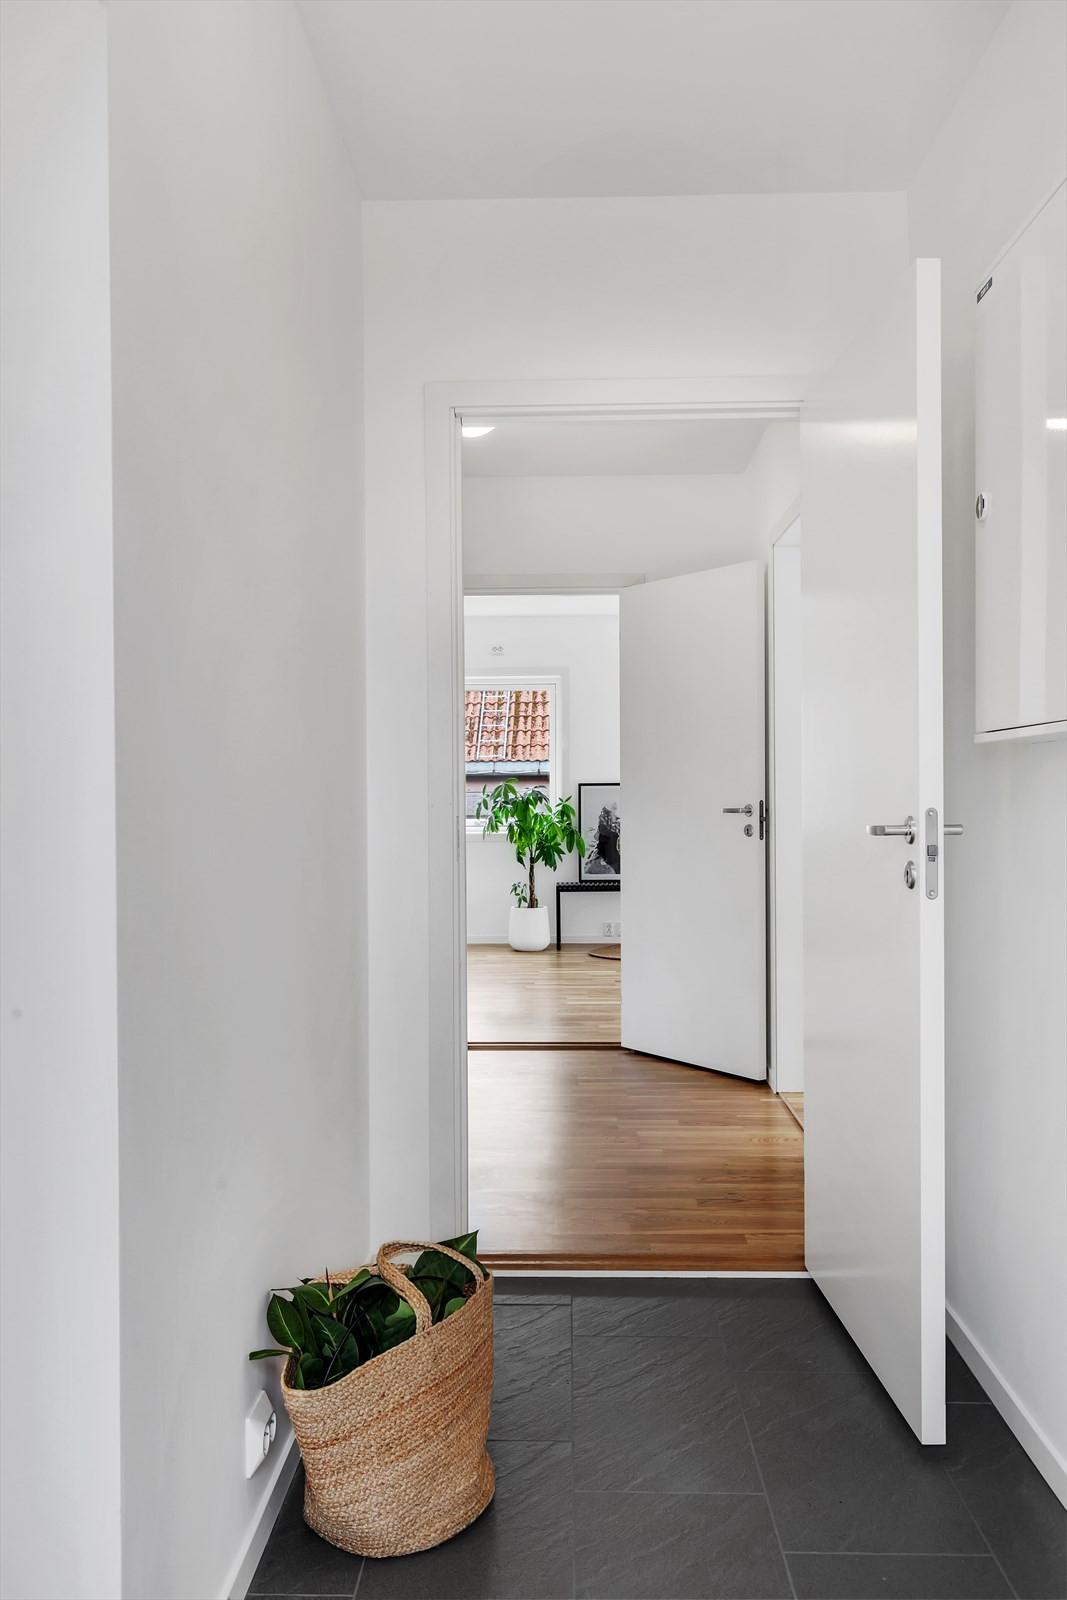 Flislagt gulv med gulvvarme i entré